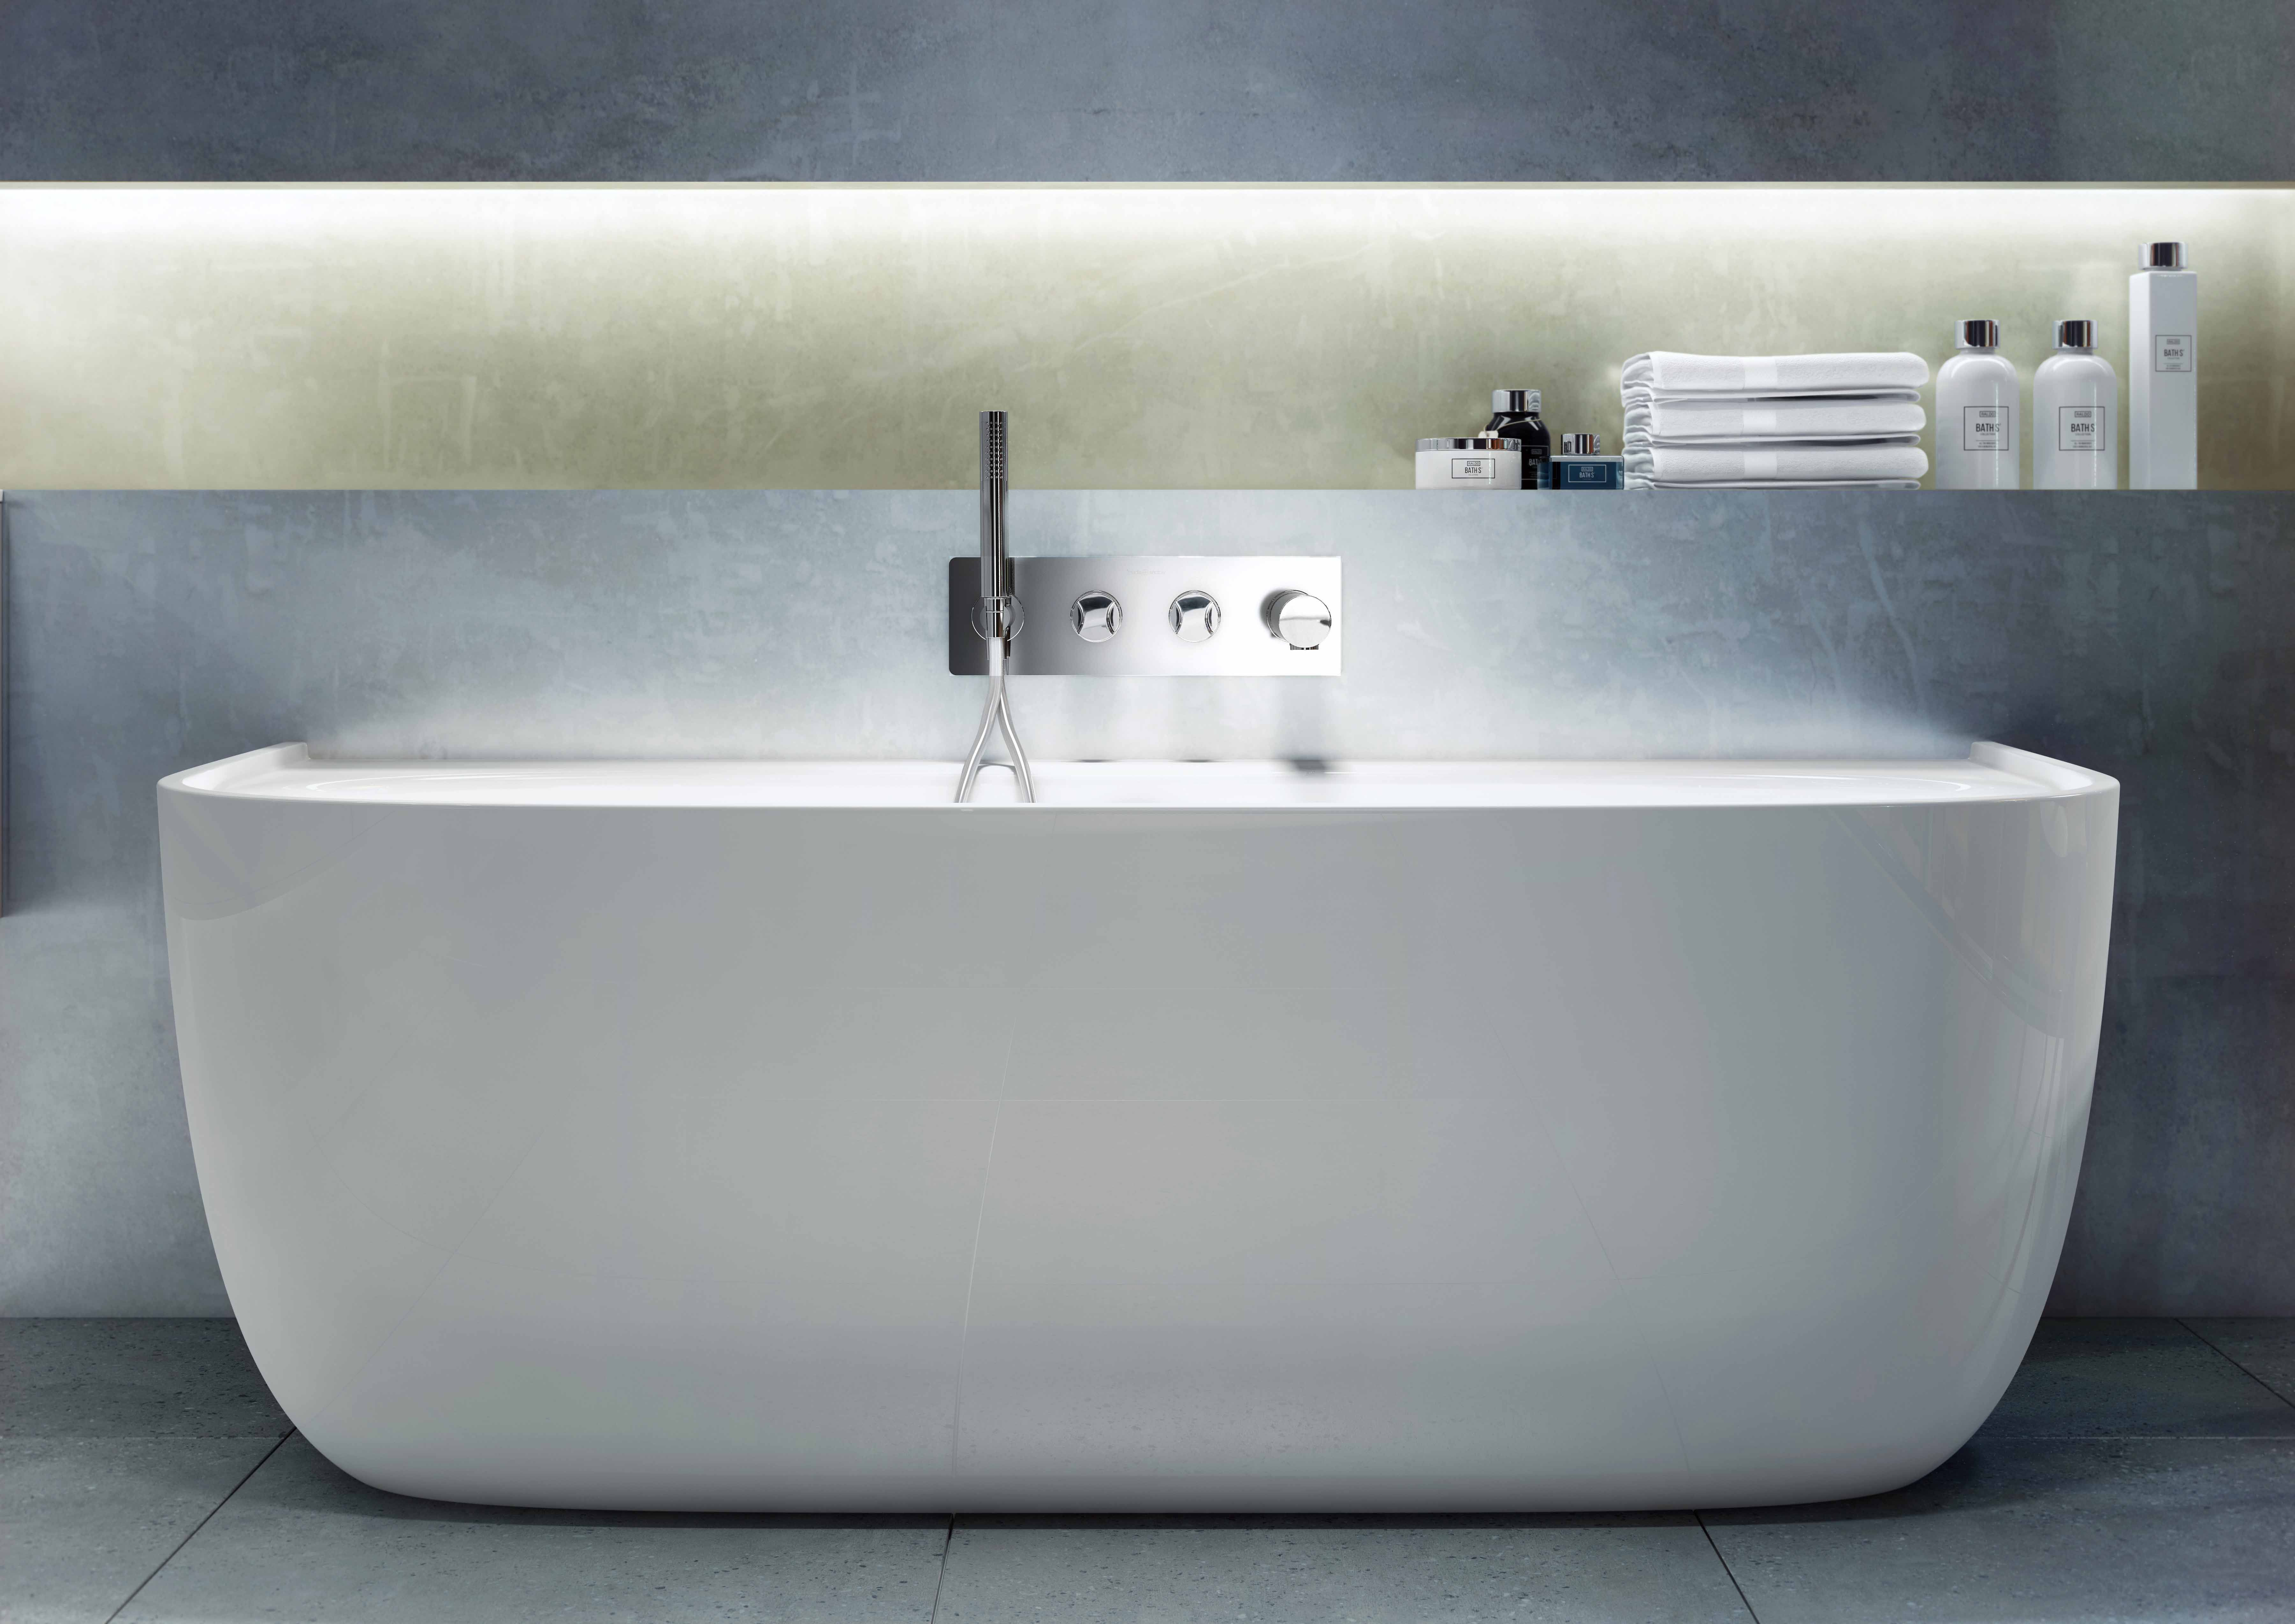 Pin by Simon\u0027s Hardware and Bath on Tubs   Pinterest   Bath, Walls ...